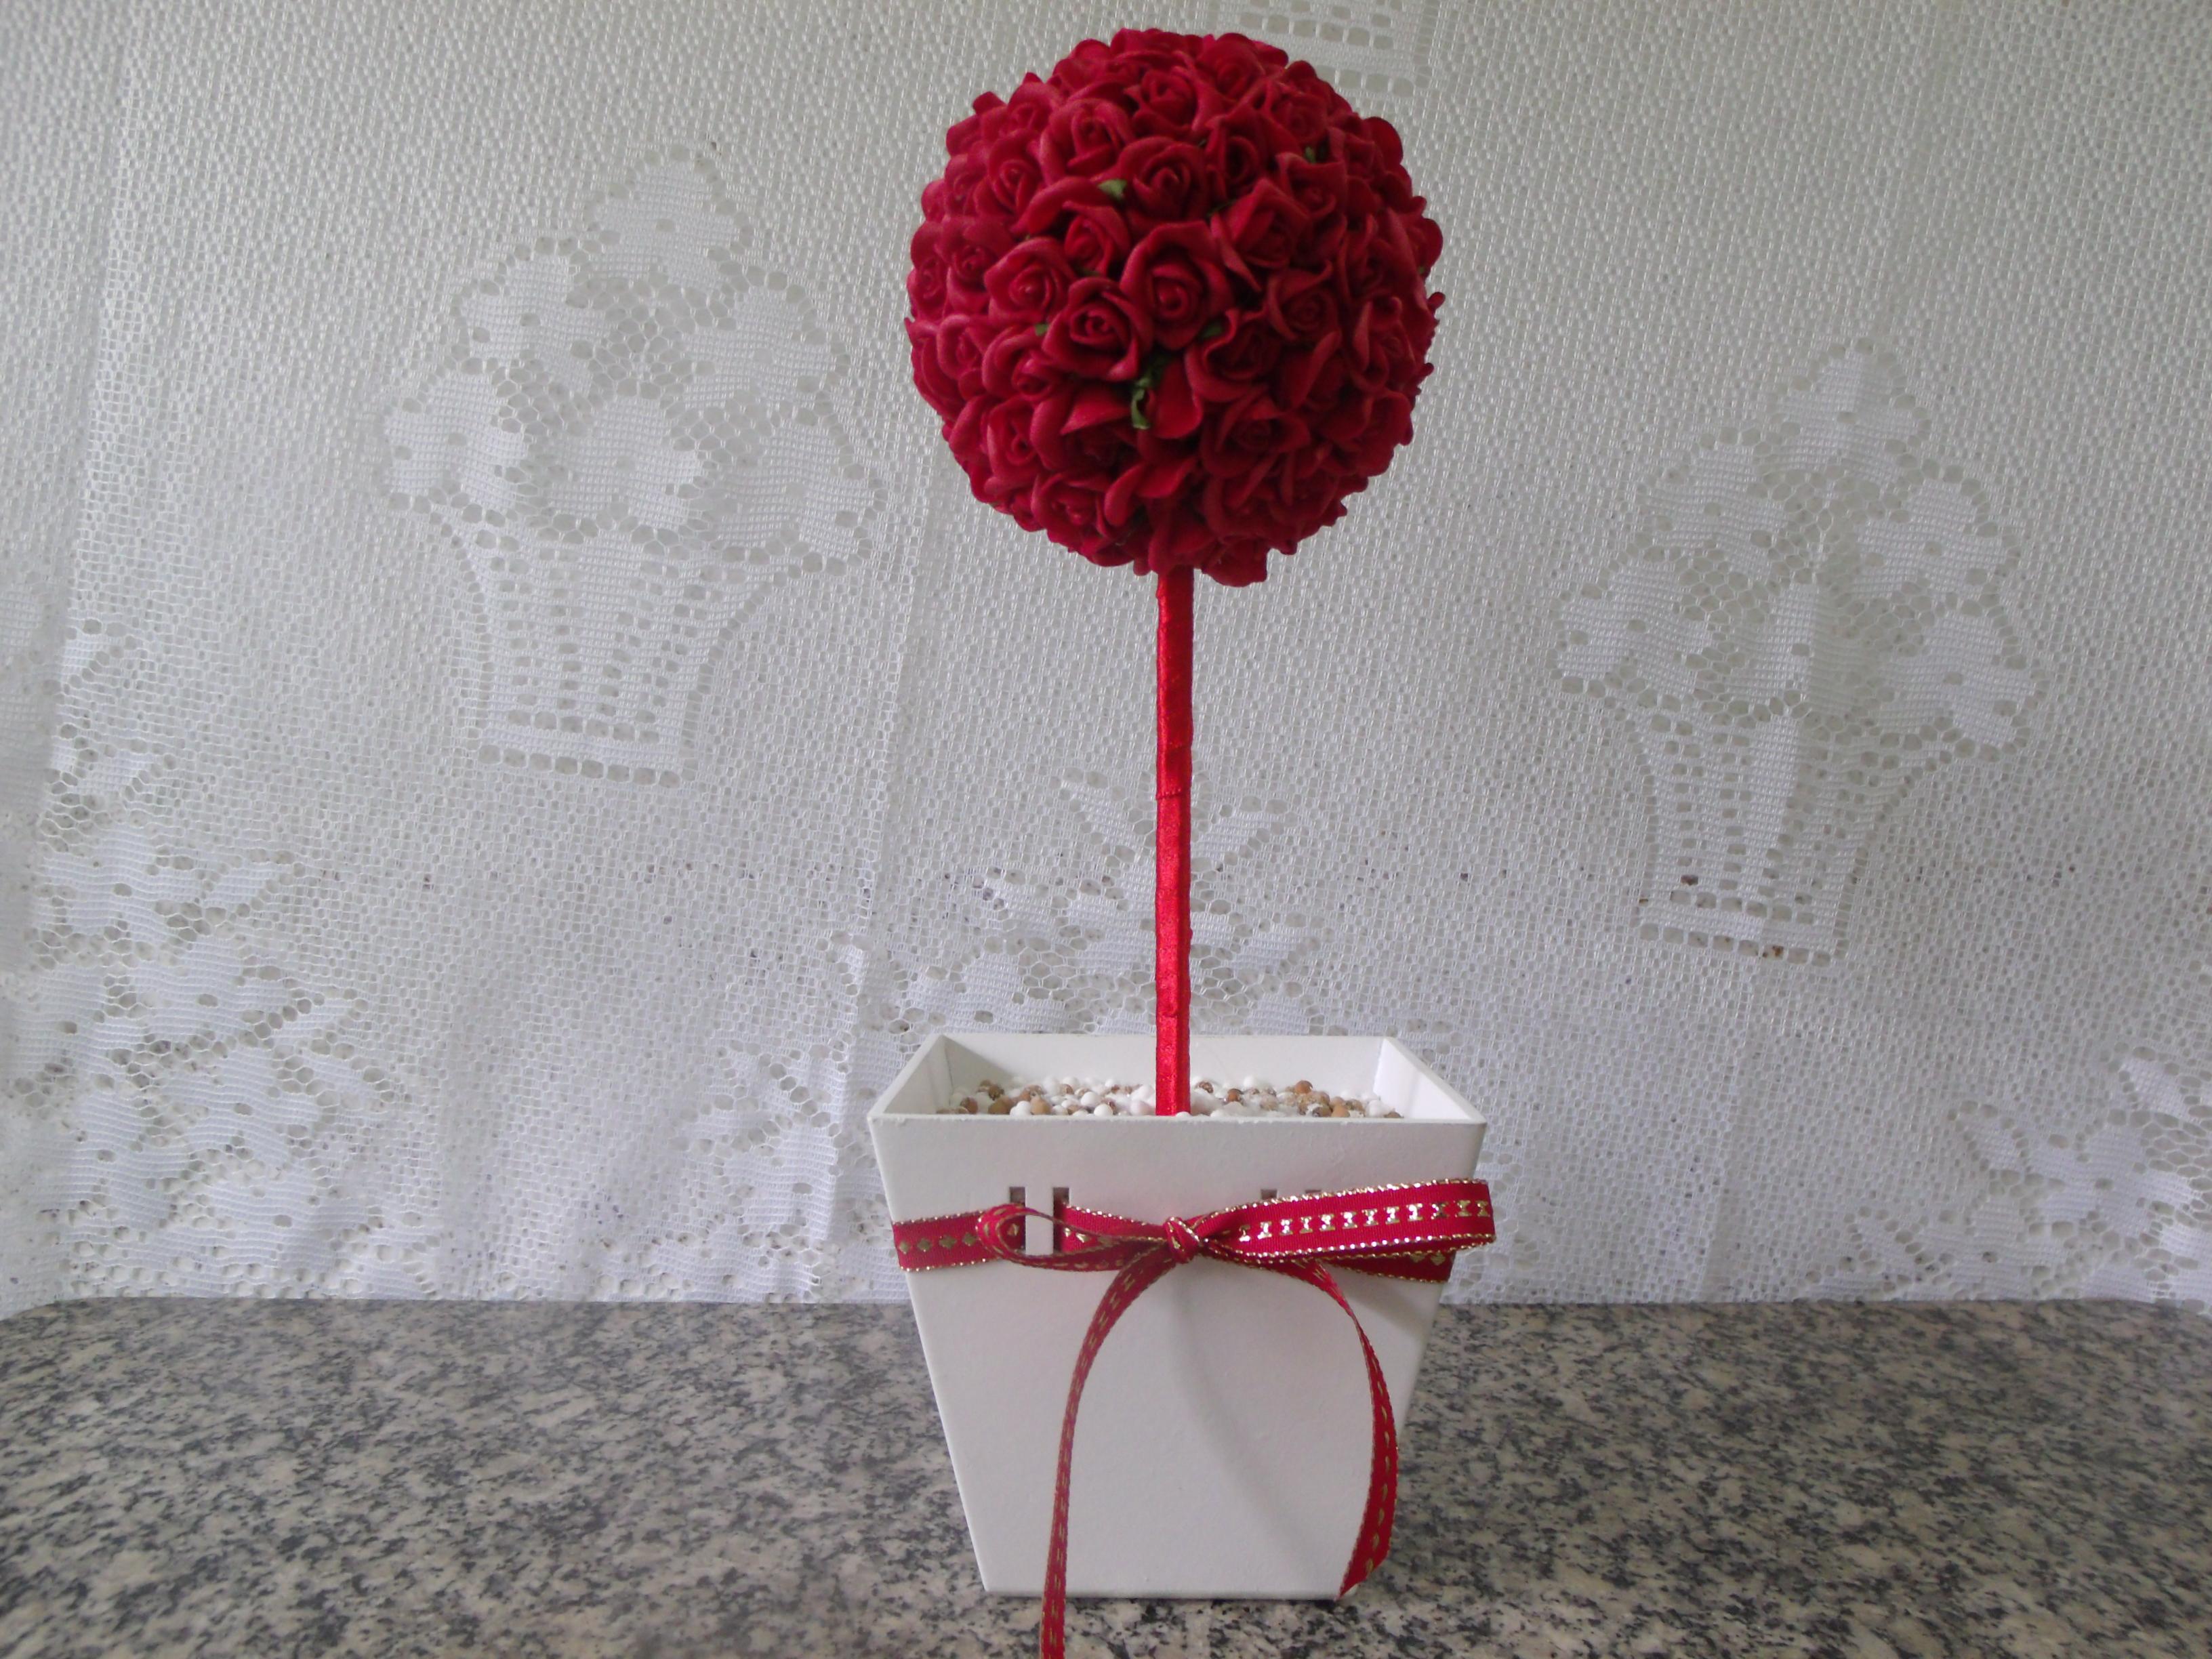 centro-de-mesa-topiaria-vermelho-enfeite-para-mesa-de-convidados